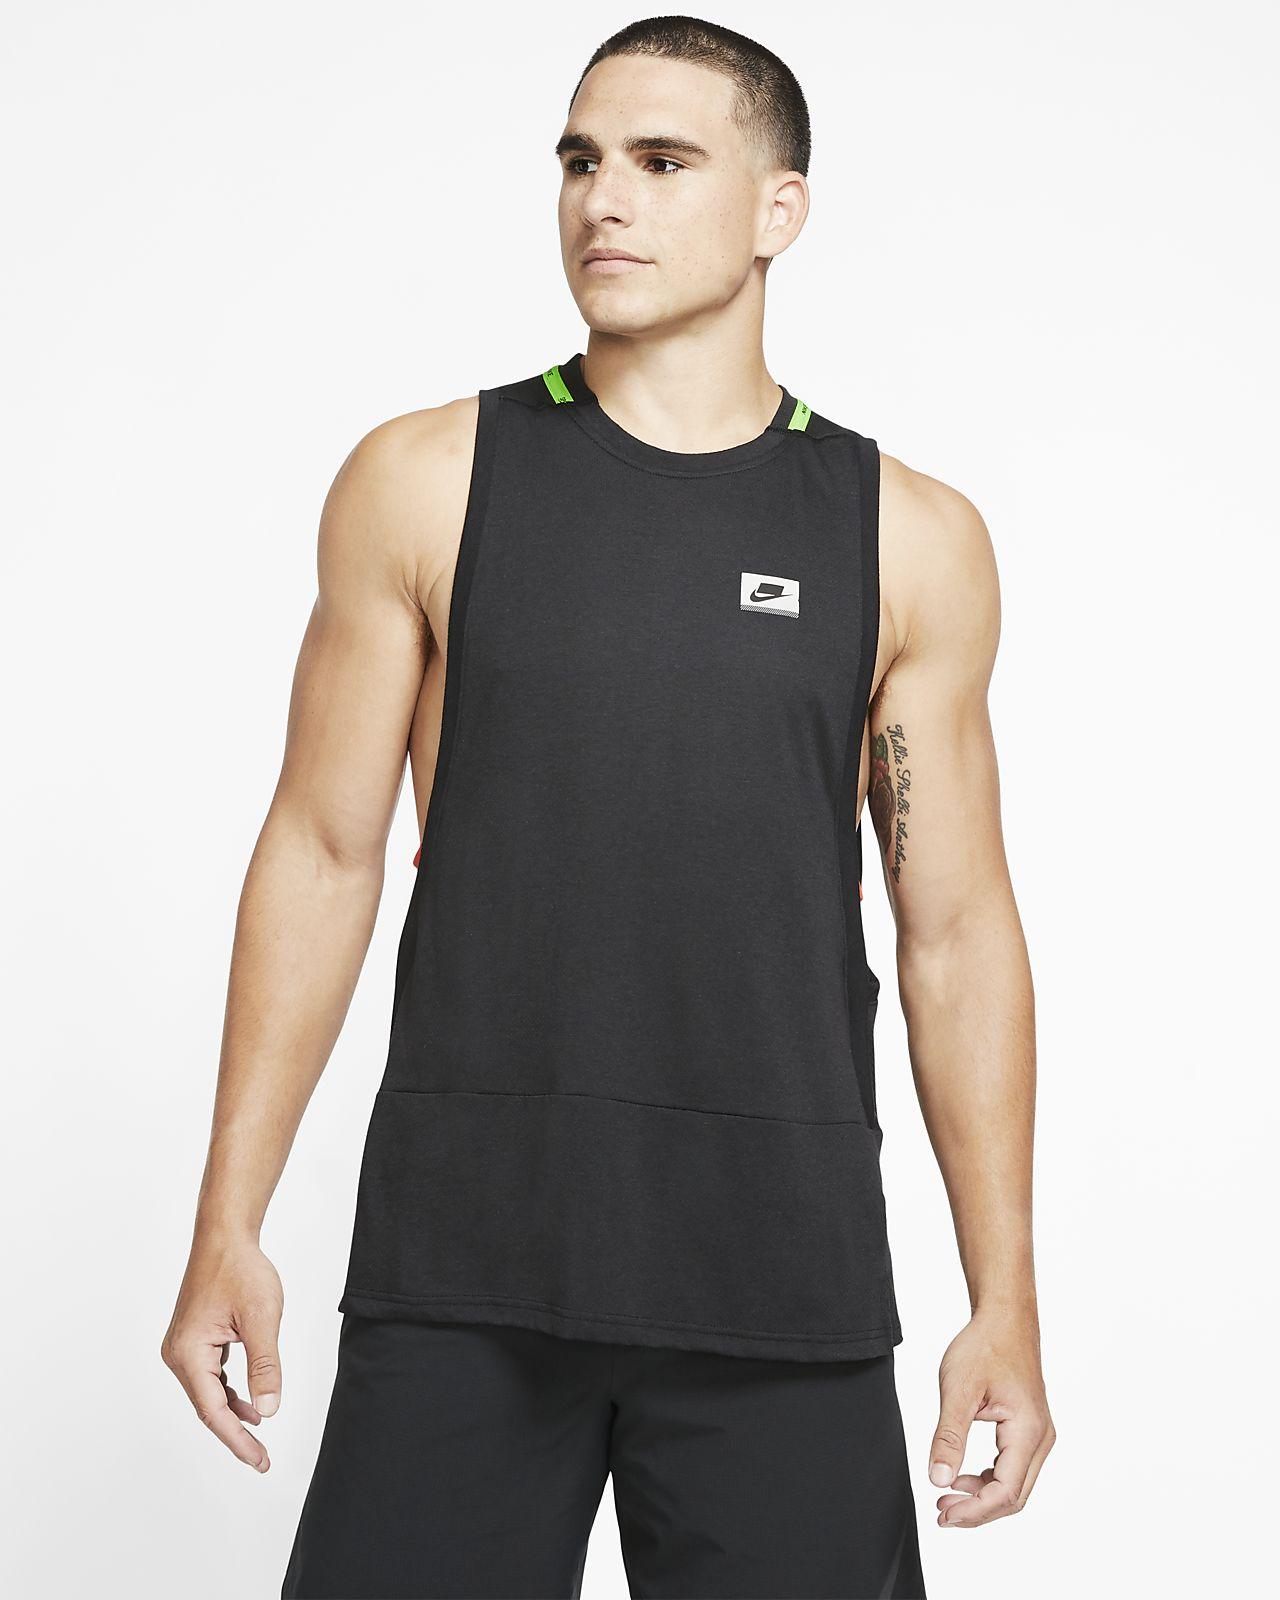 Pánské tréninkové tílko Nike Dri-FIT Sport Clash